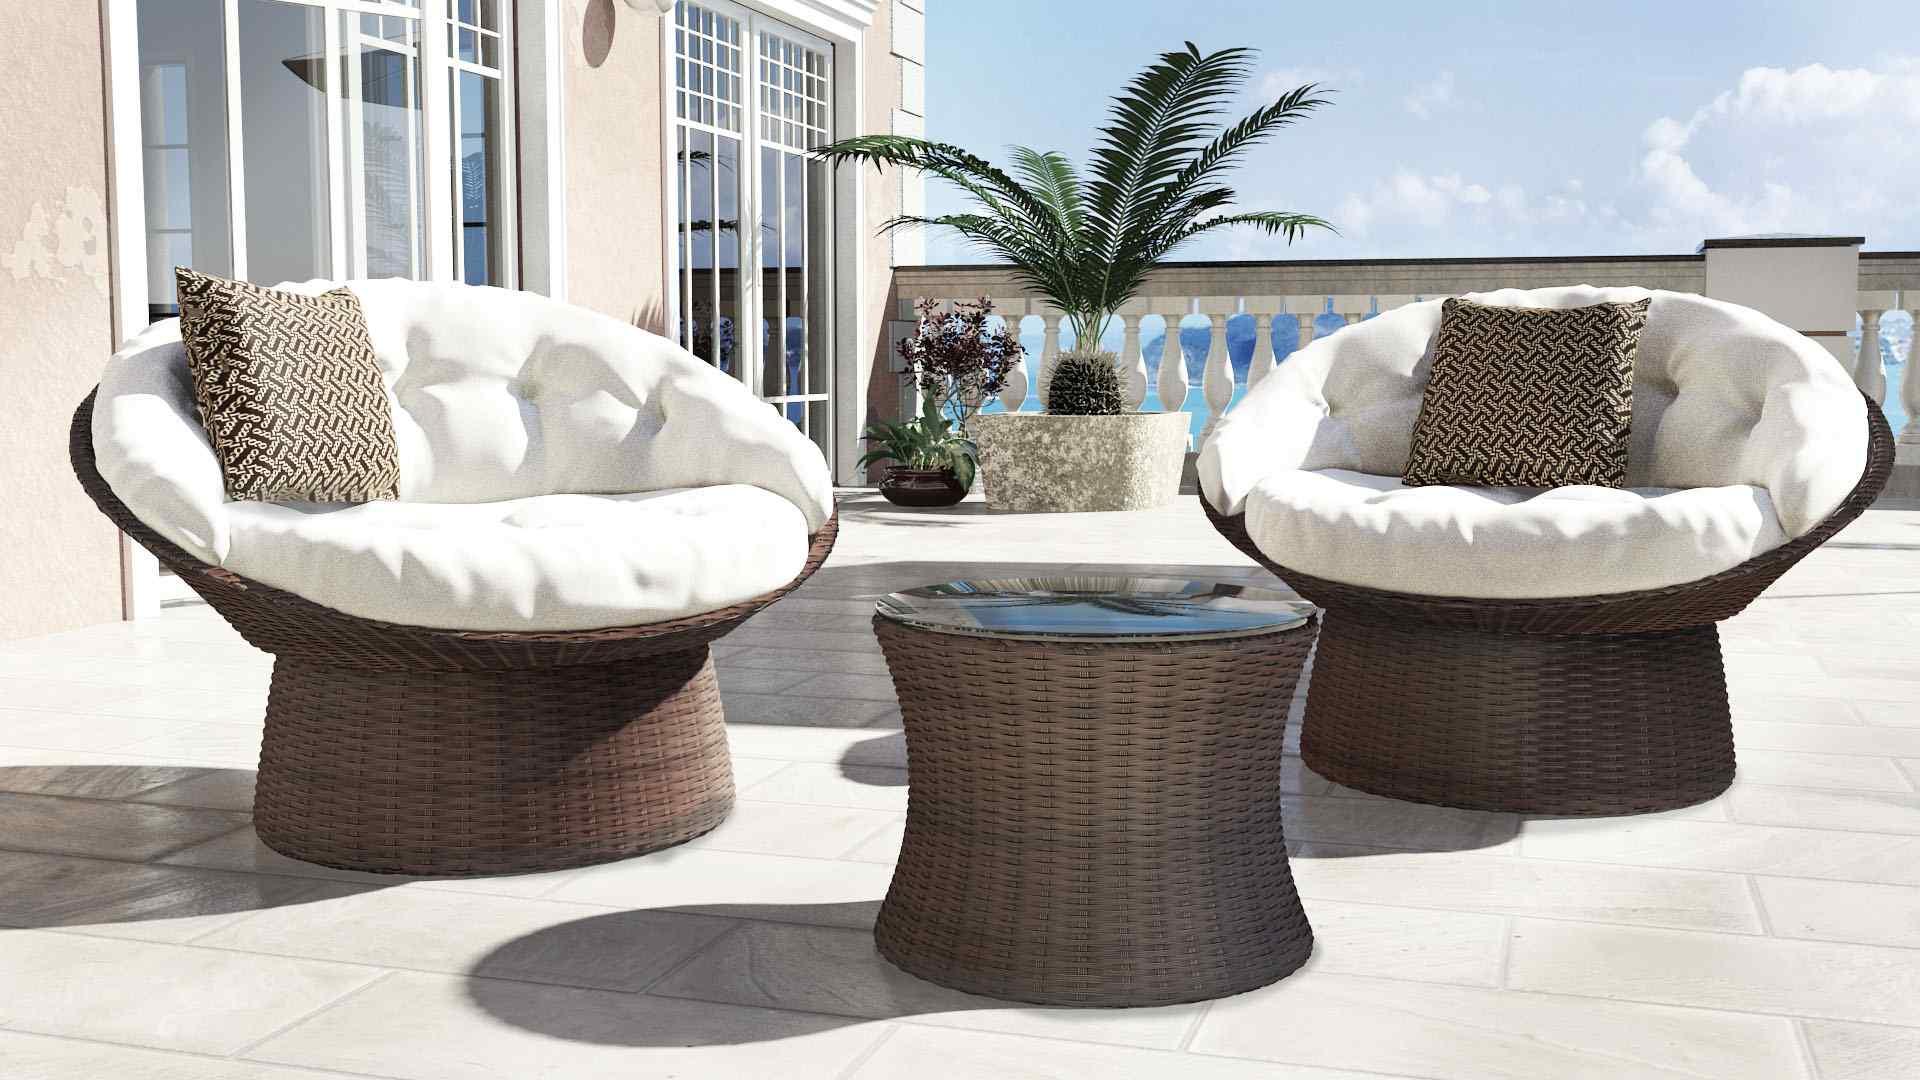 artelia jetzt die polyrattan papasan set calipso f r 2 personen kaufen. Black Bedroom Furniture Sets. Home Design Ideas